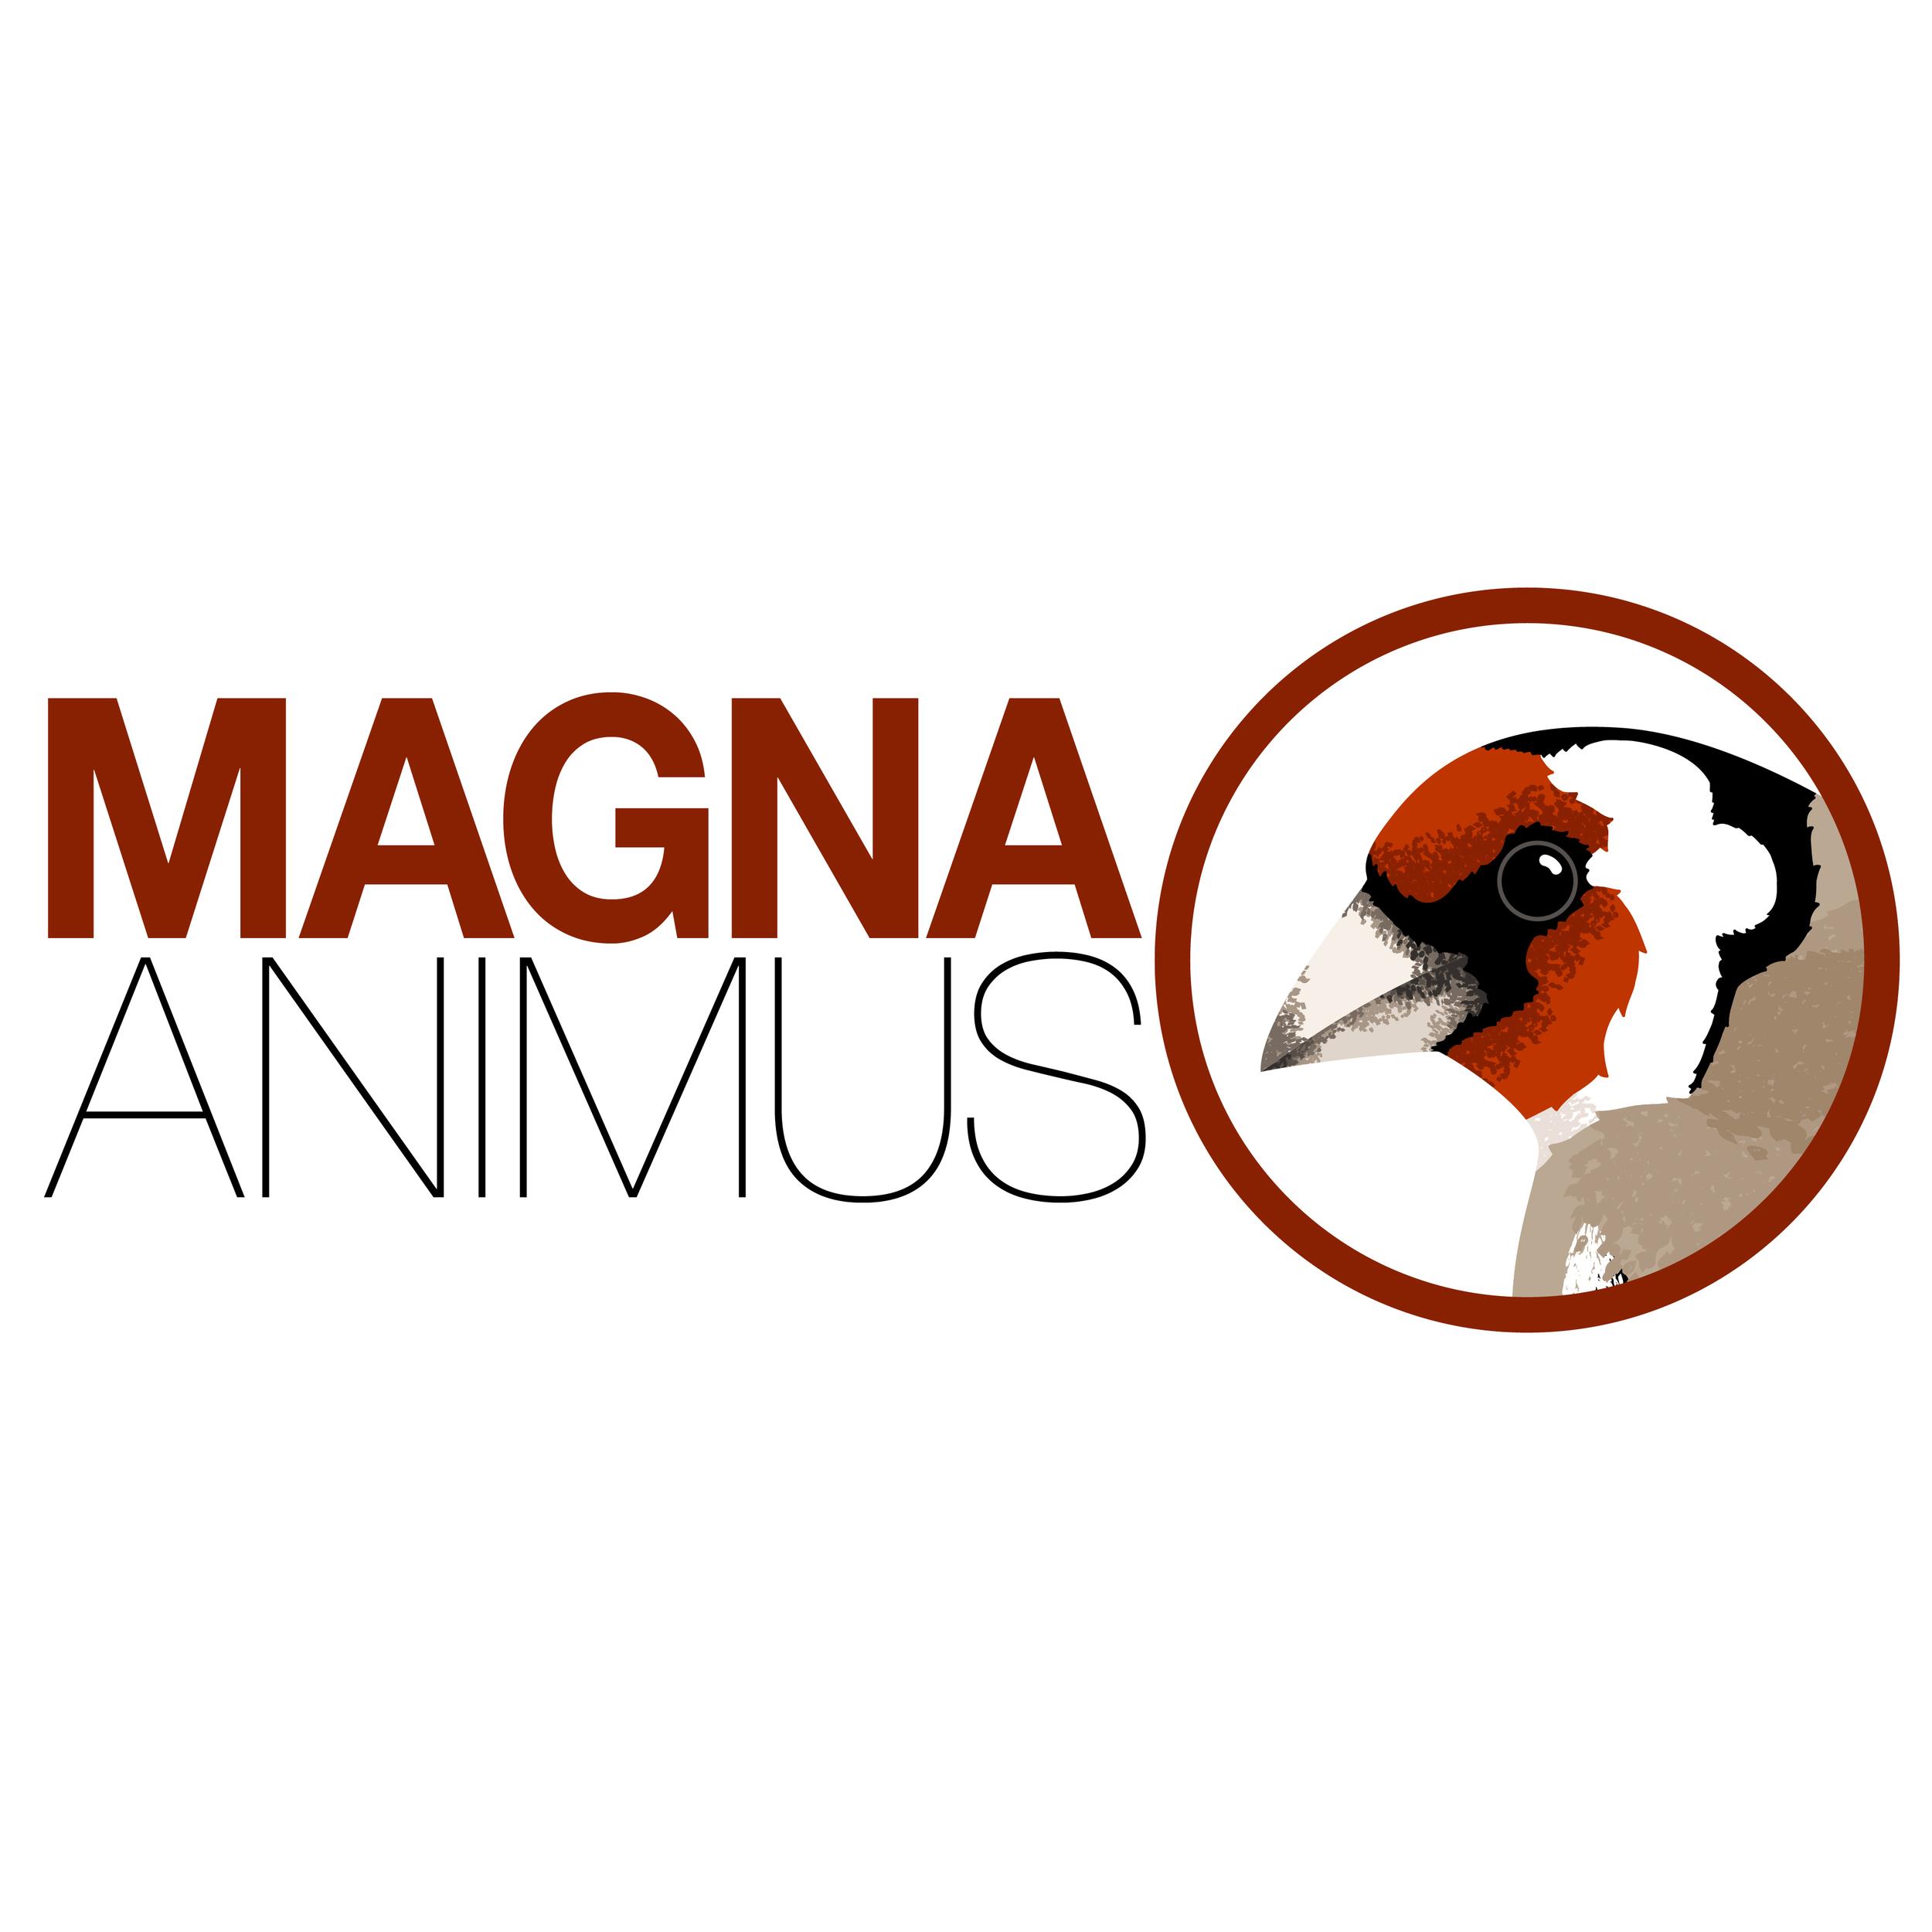 magnaanimus-01.jpg